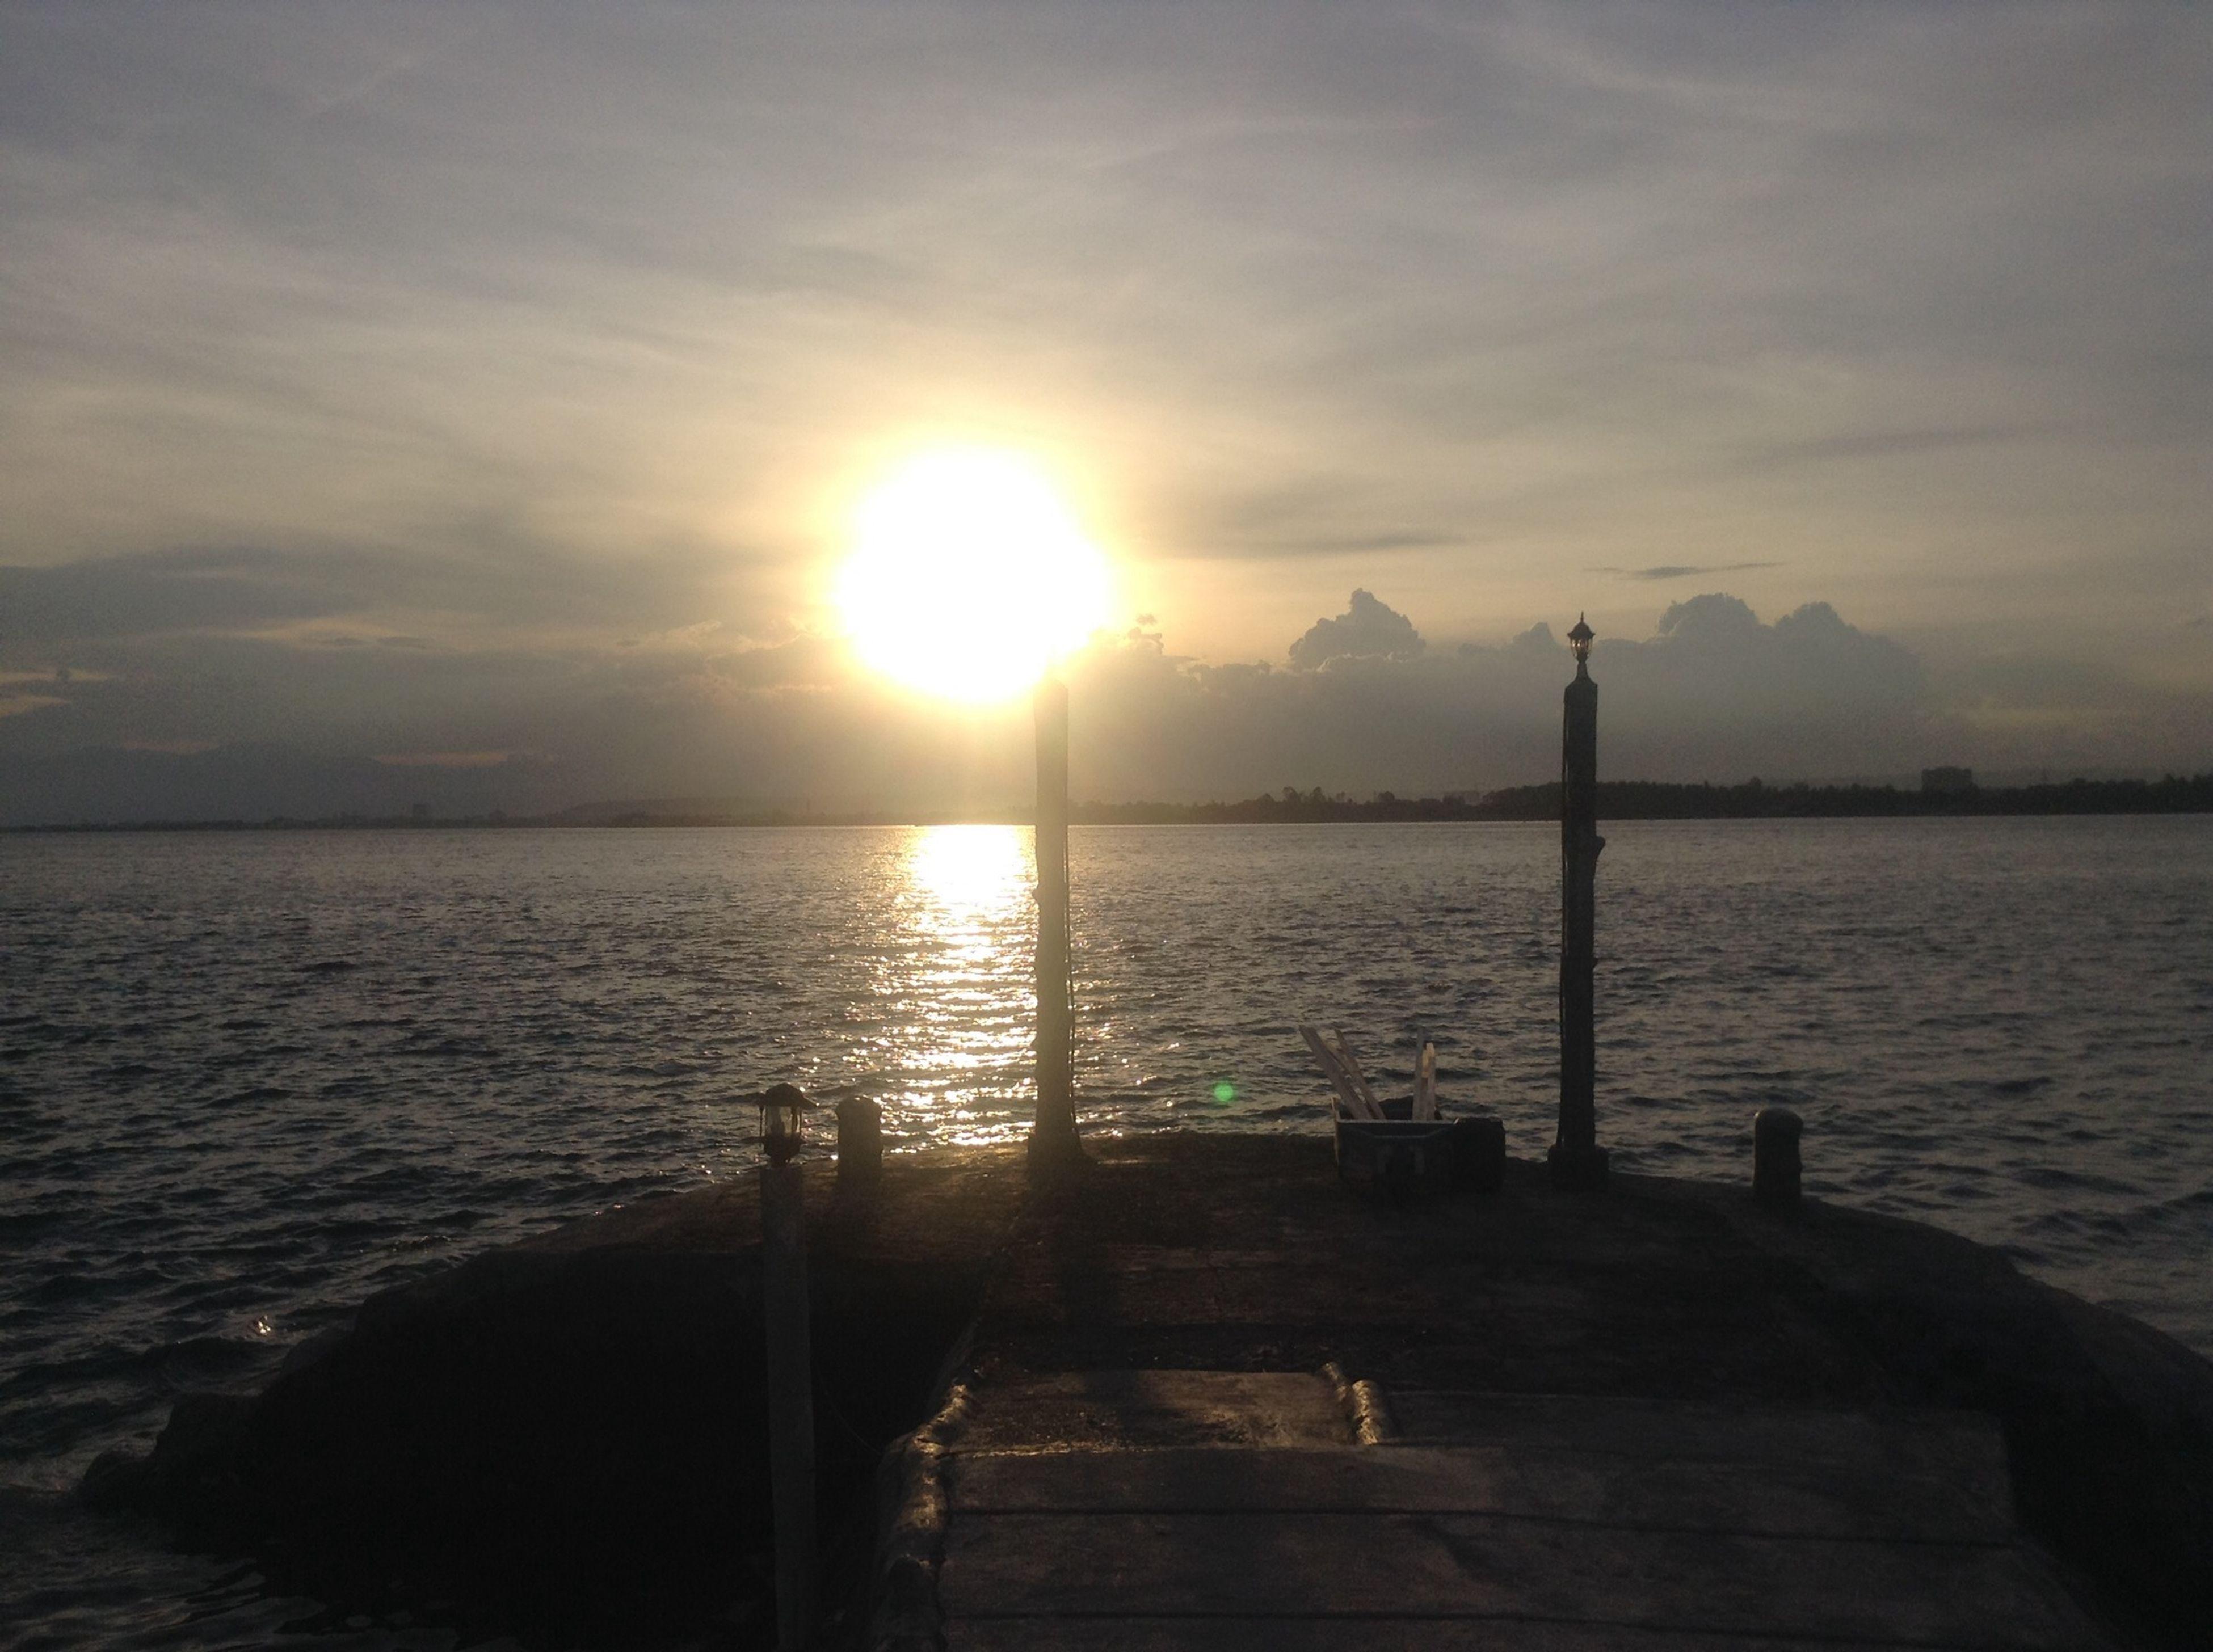 water, sun, sunset, sky, sea, scenics, tranquil scene, tranquility, beauty in nature, transportation, nature, nautical vessel, cloud - sky, silhouette, sunlight, pier, rippled, sunbeam, boat, idyllic